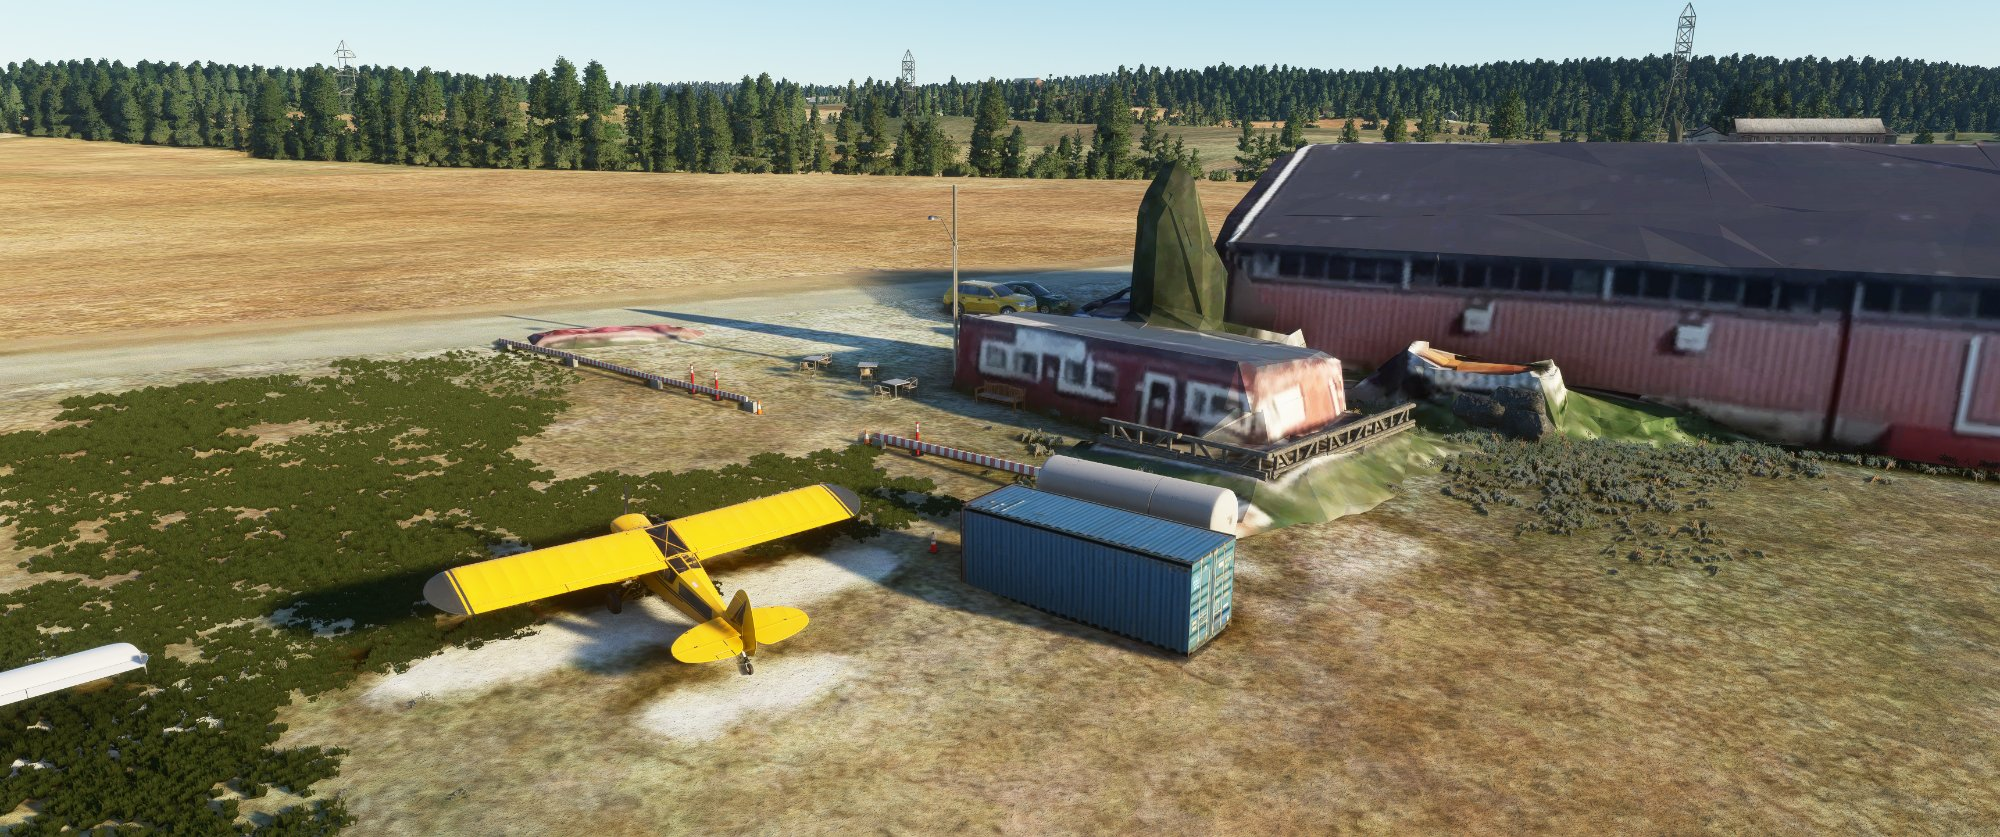 Microsoft Flight Simulator Screenshot 2020.11.06 - 12.18.49.06.jpg